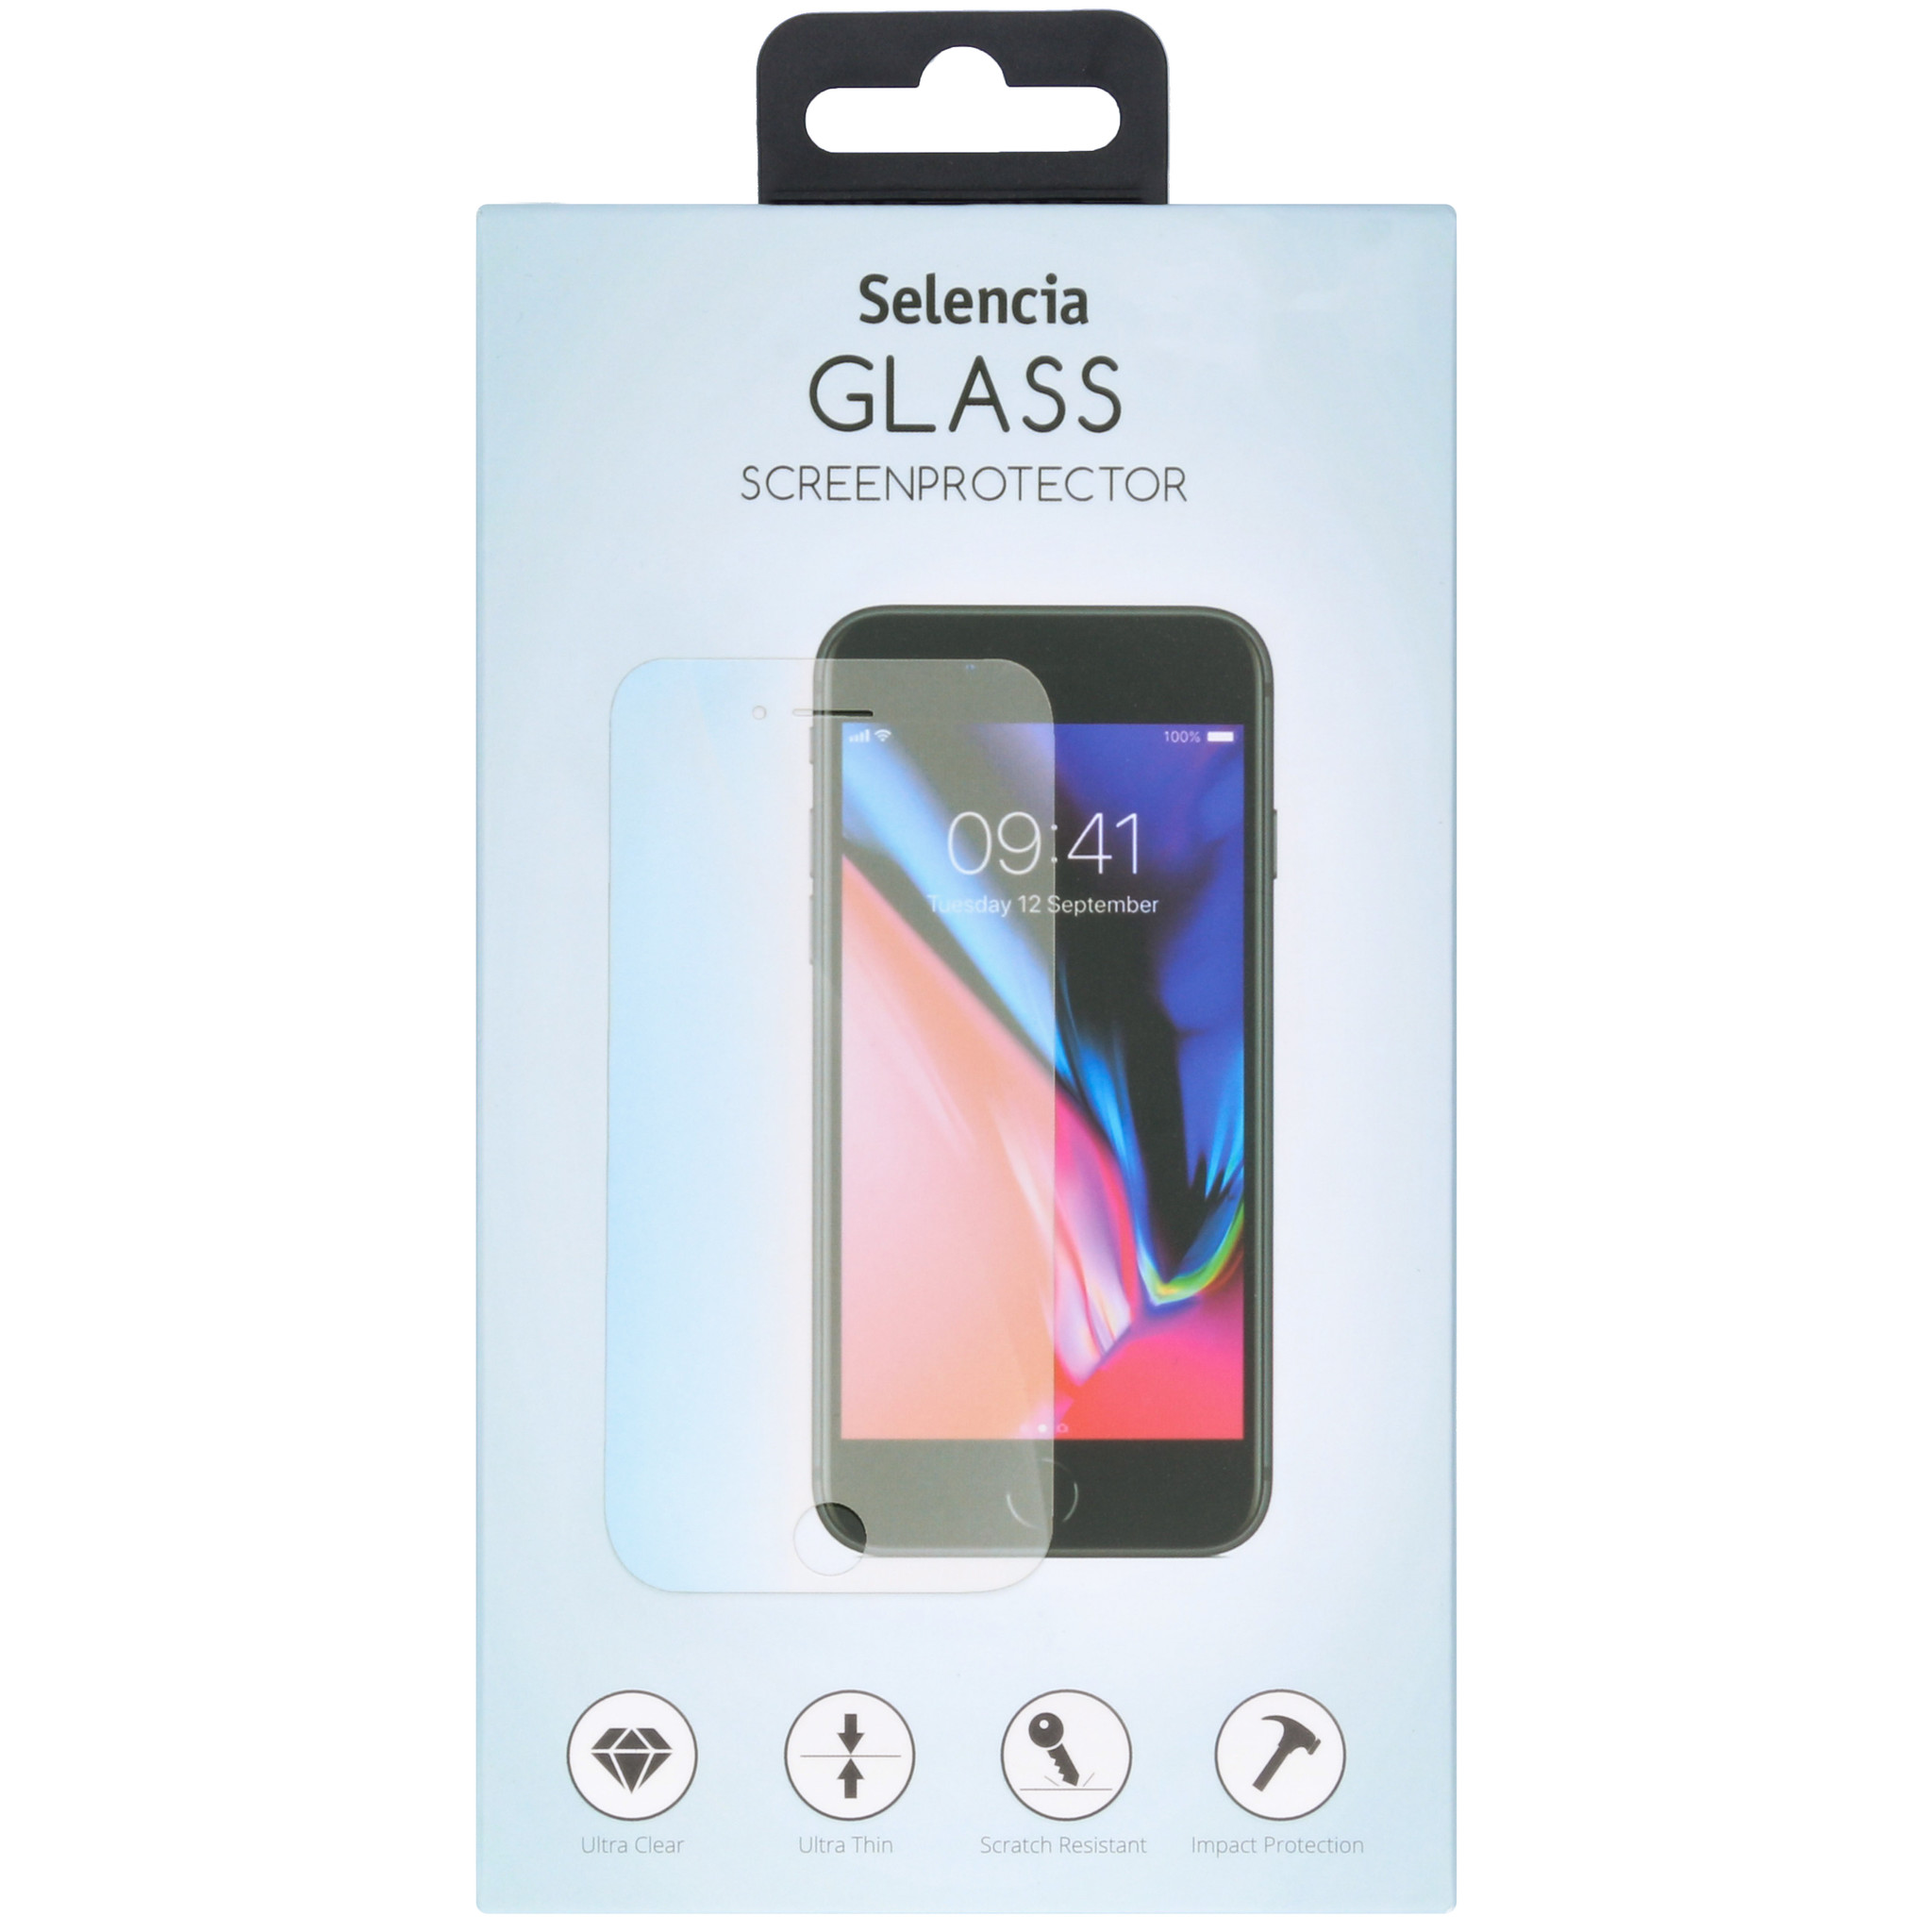 Selencia Gehard Glas Screenprotector OnePlus 6T